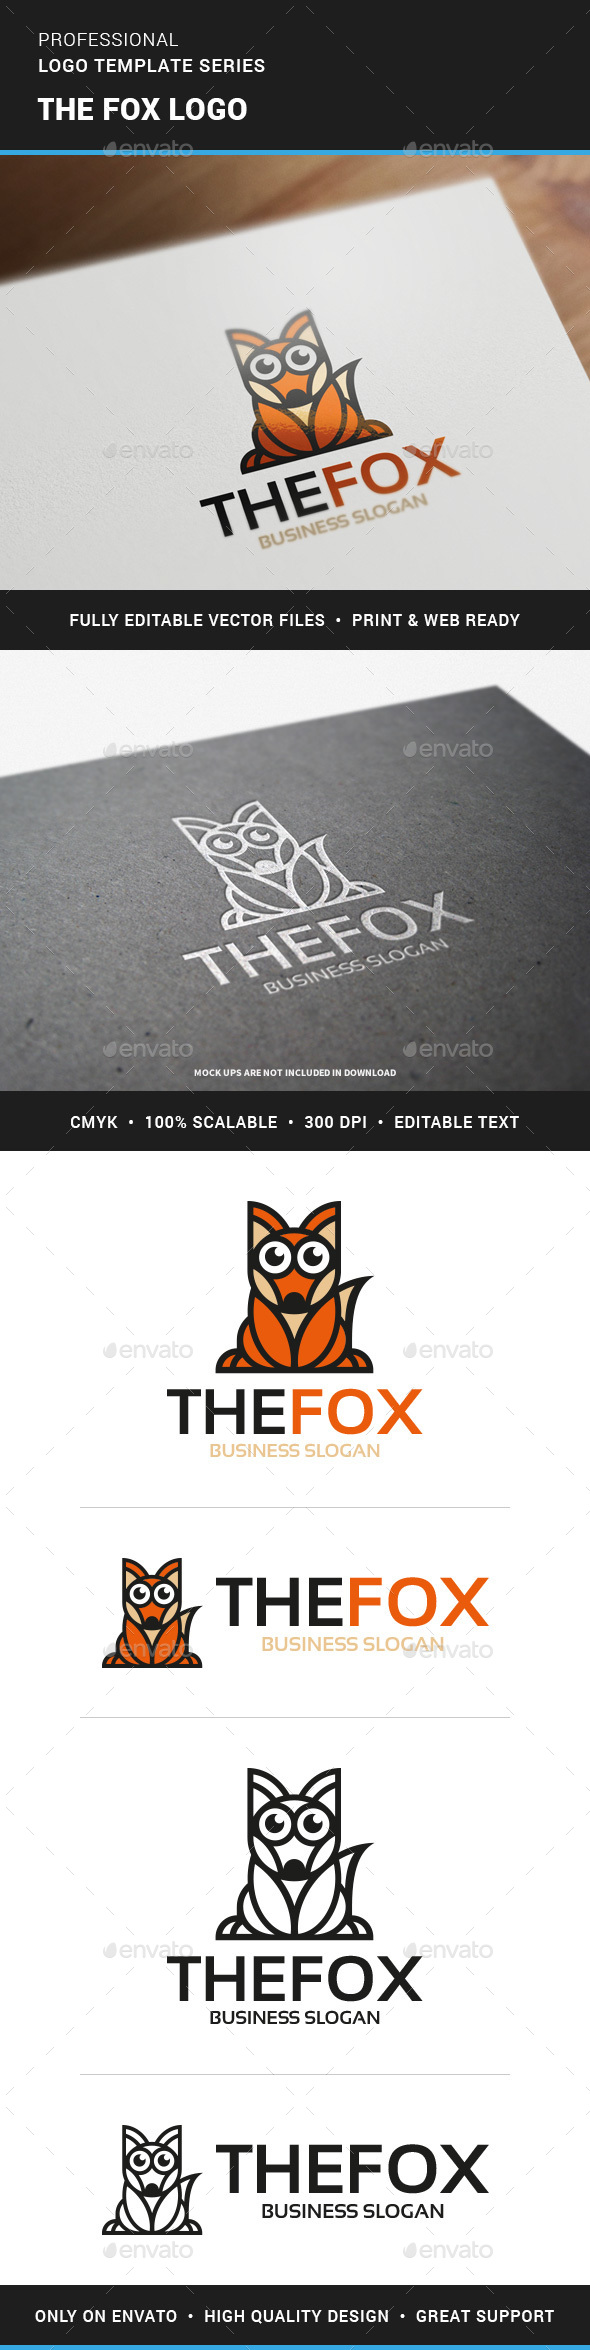 The Fox Logo Template - Animals Logo Templates